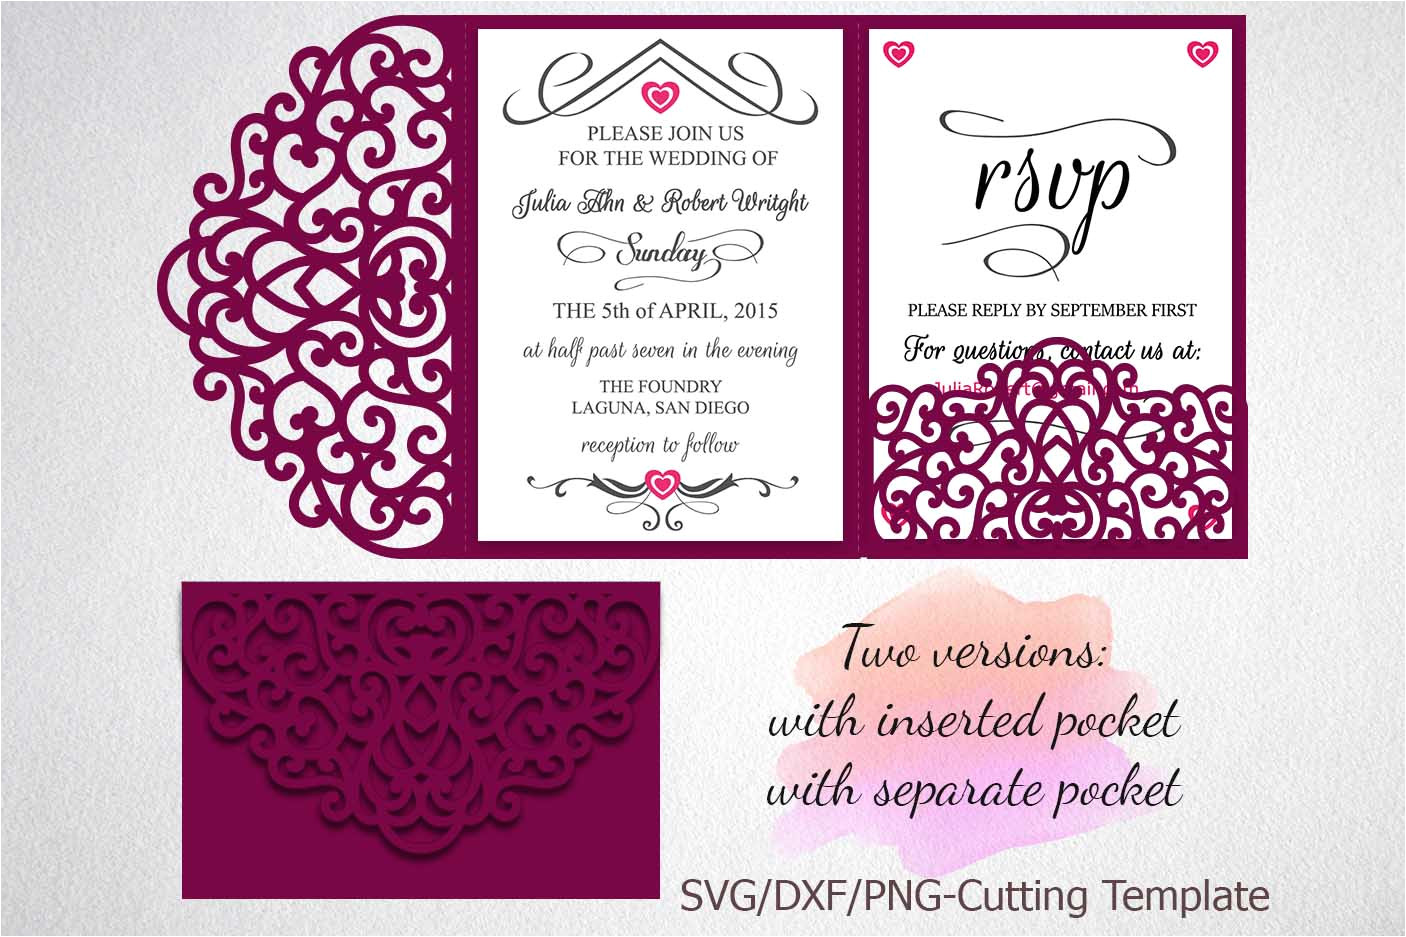 78803 tri fold wedding invitation pocket envelope svg dxf template